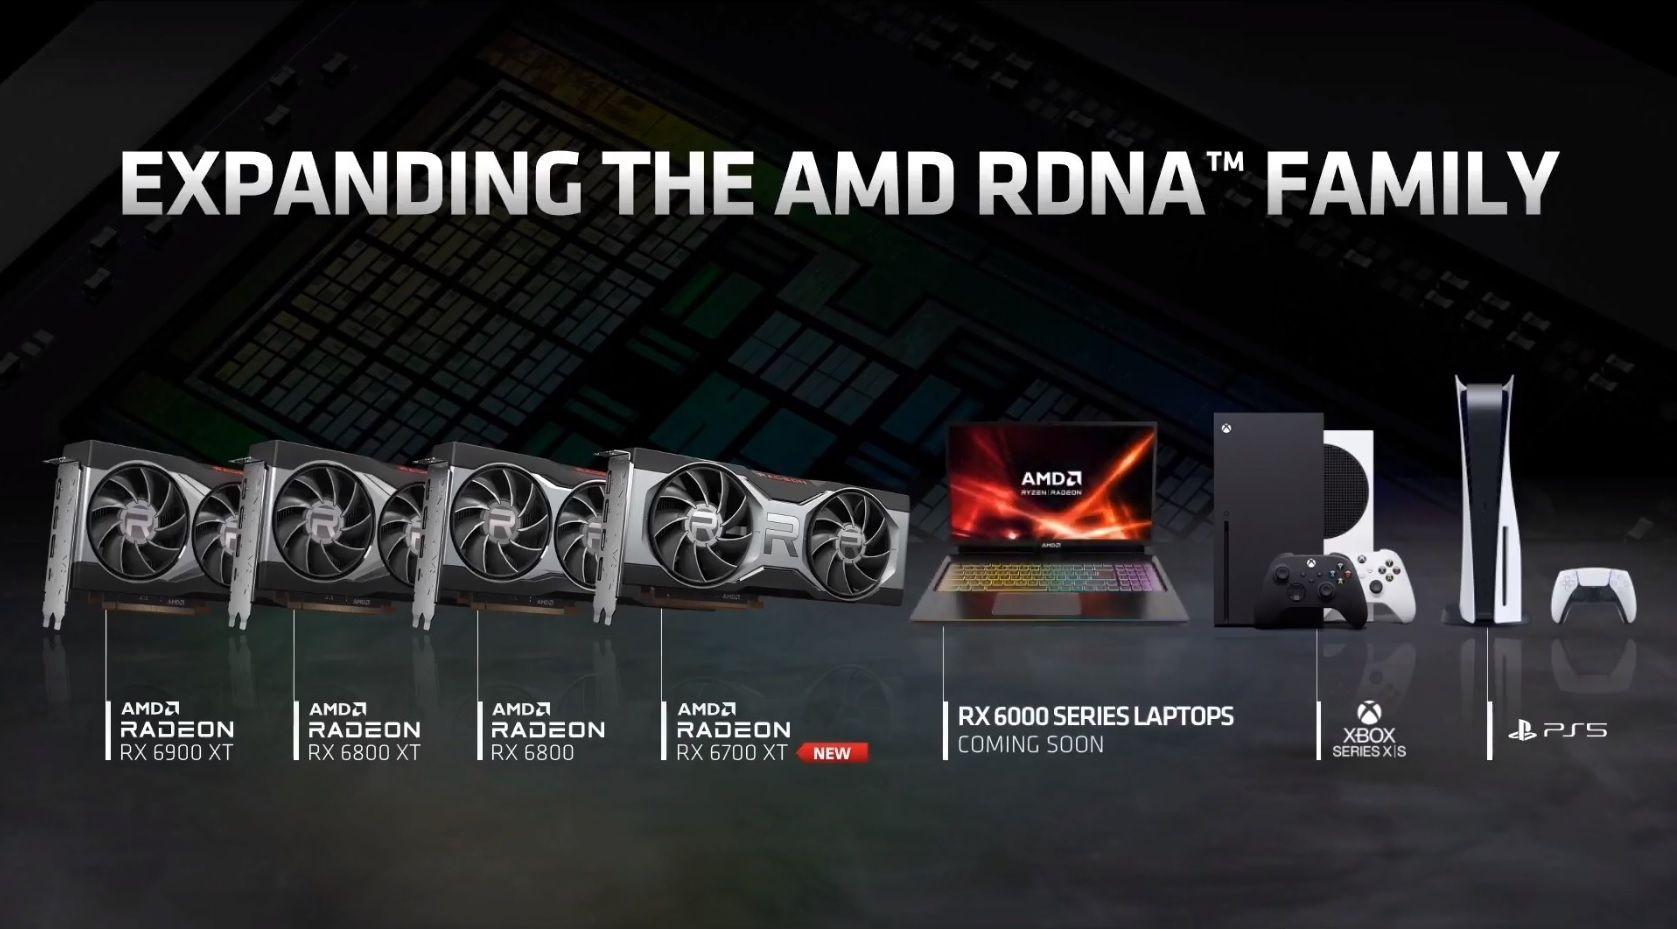 AMD Radeon RX 6000 laptops